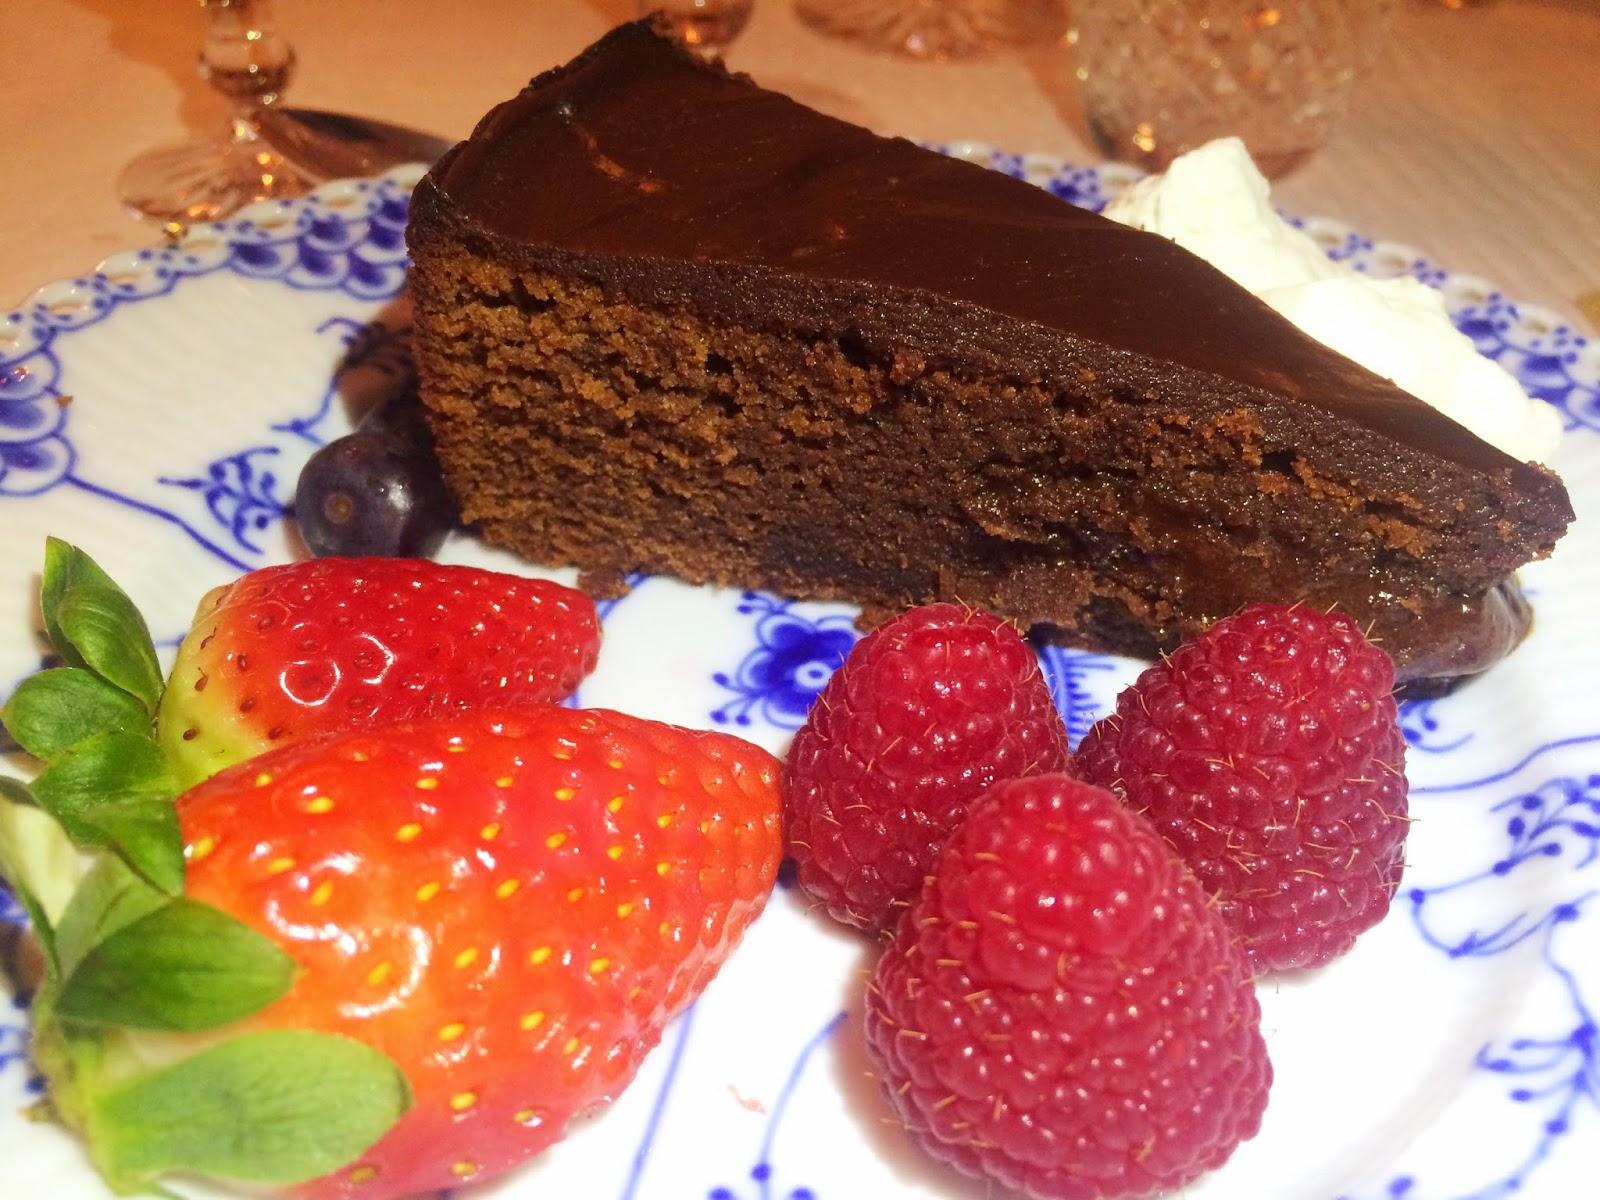 fransk chokladtårta glutenfri